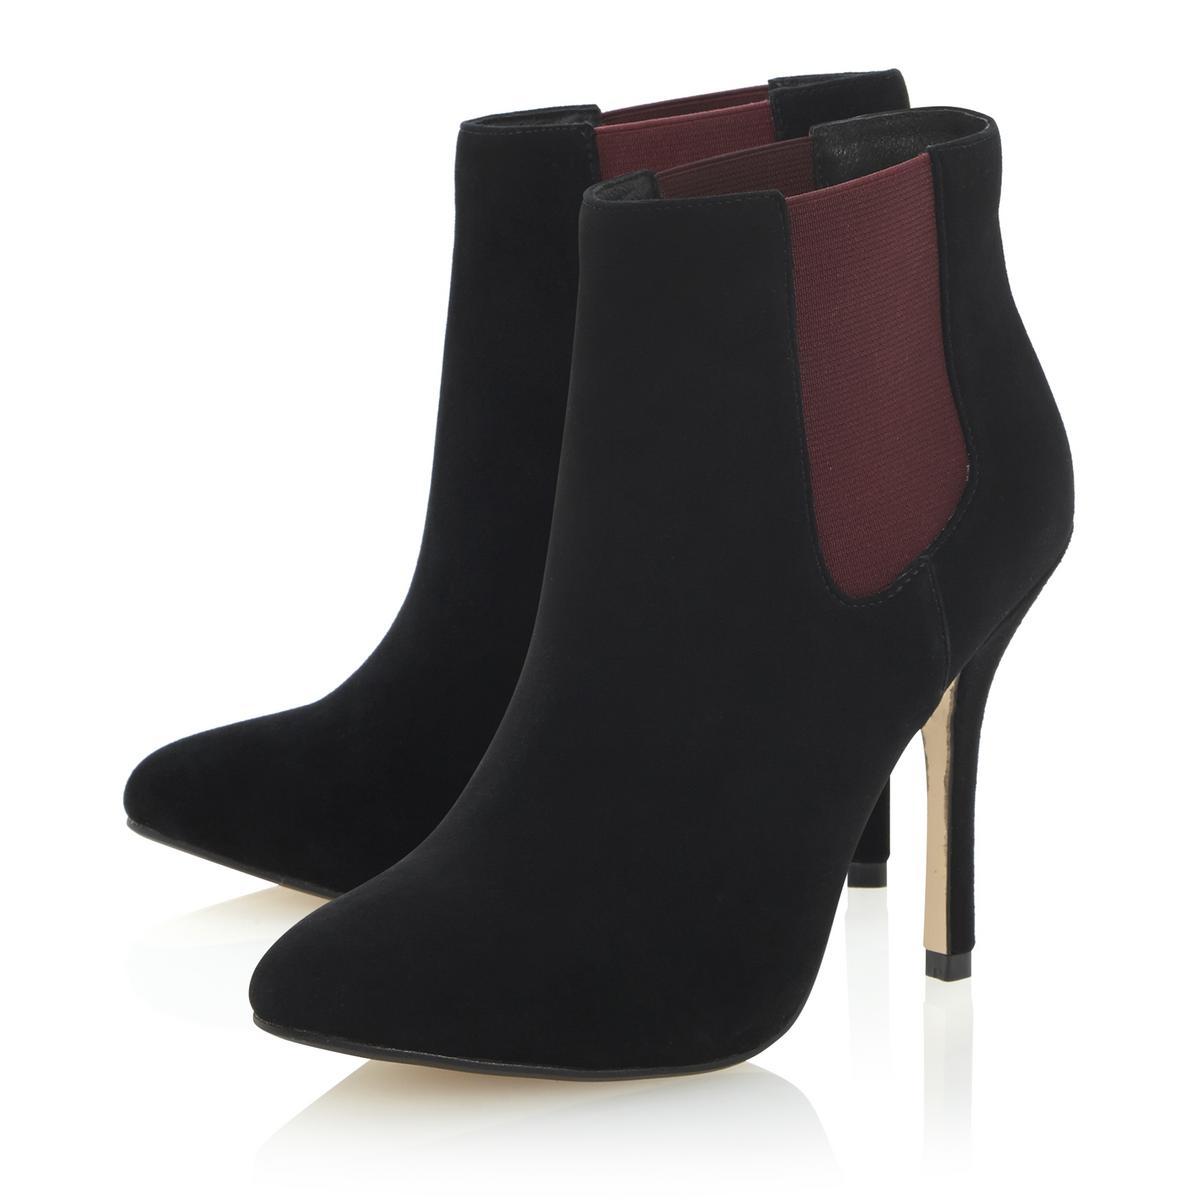 dune neesh womens black suede stiletto heel chelsea